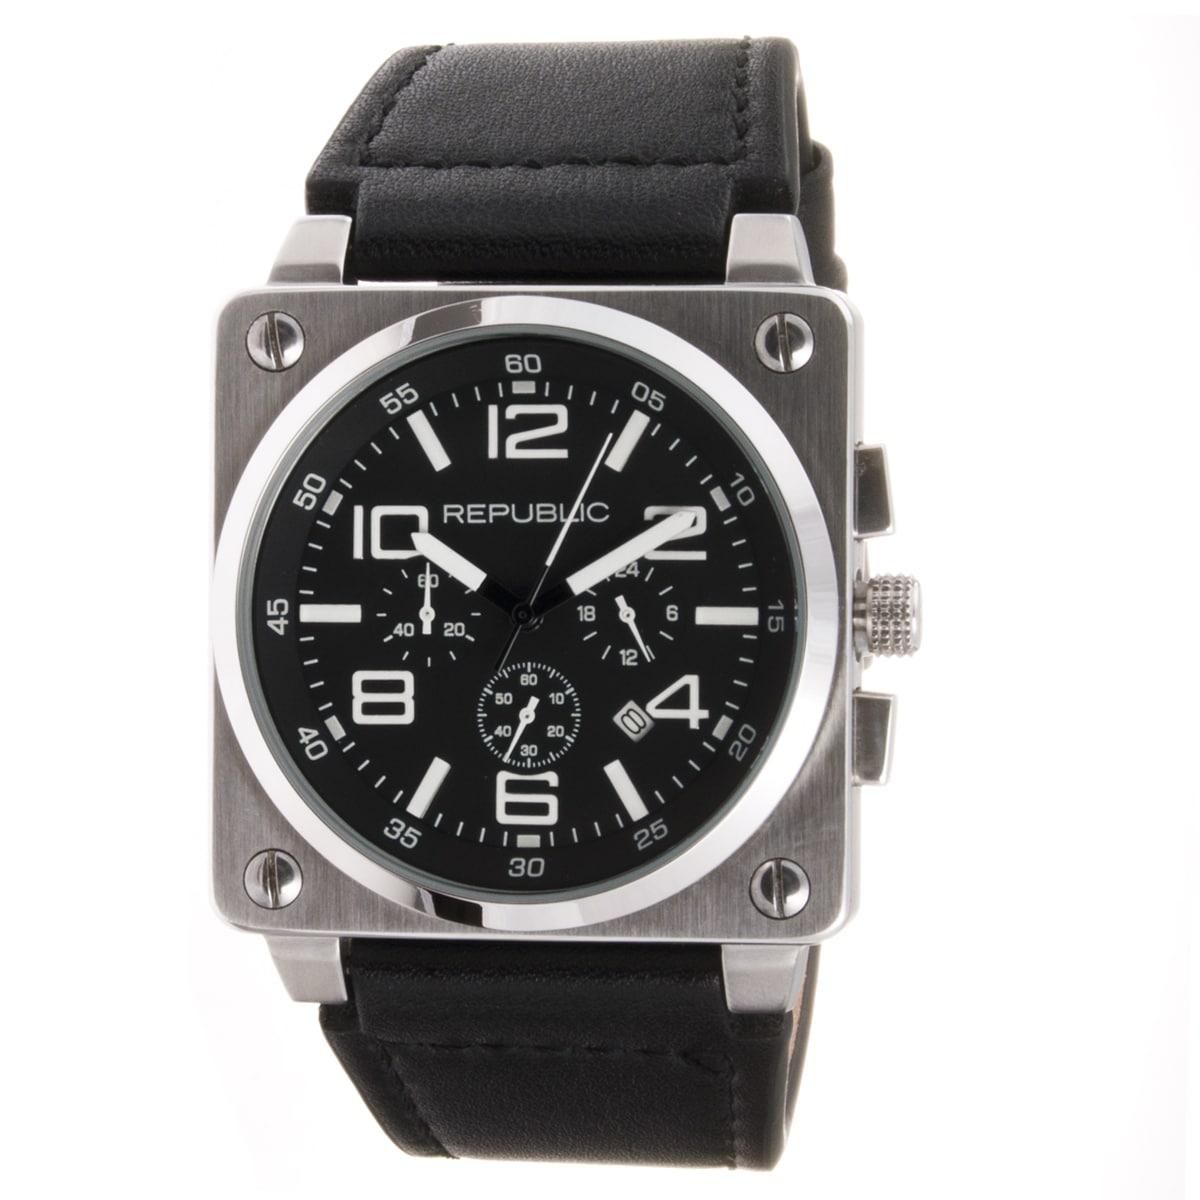 Republic Men's Black Leather Strap Chrono Aviation Watch